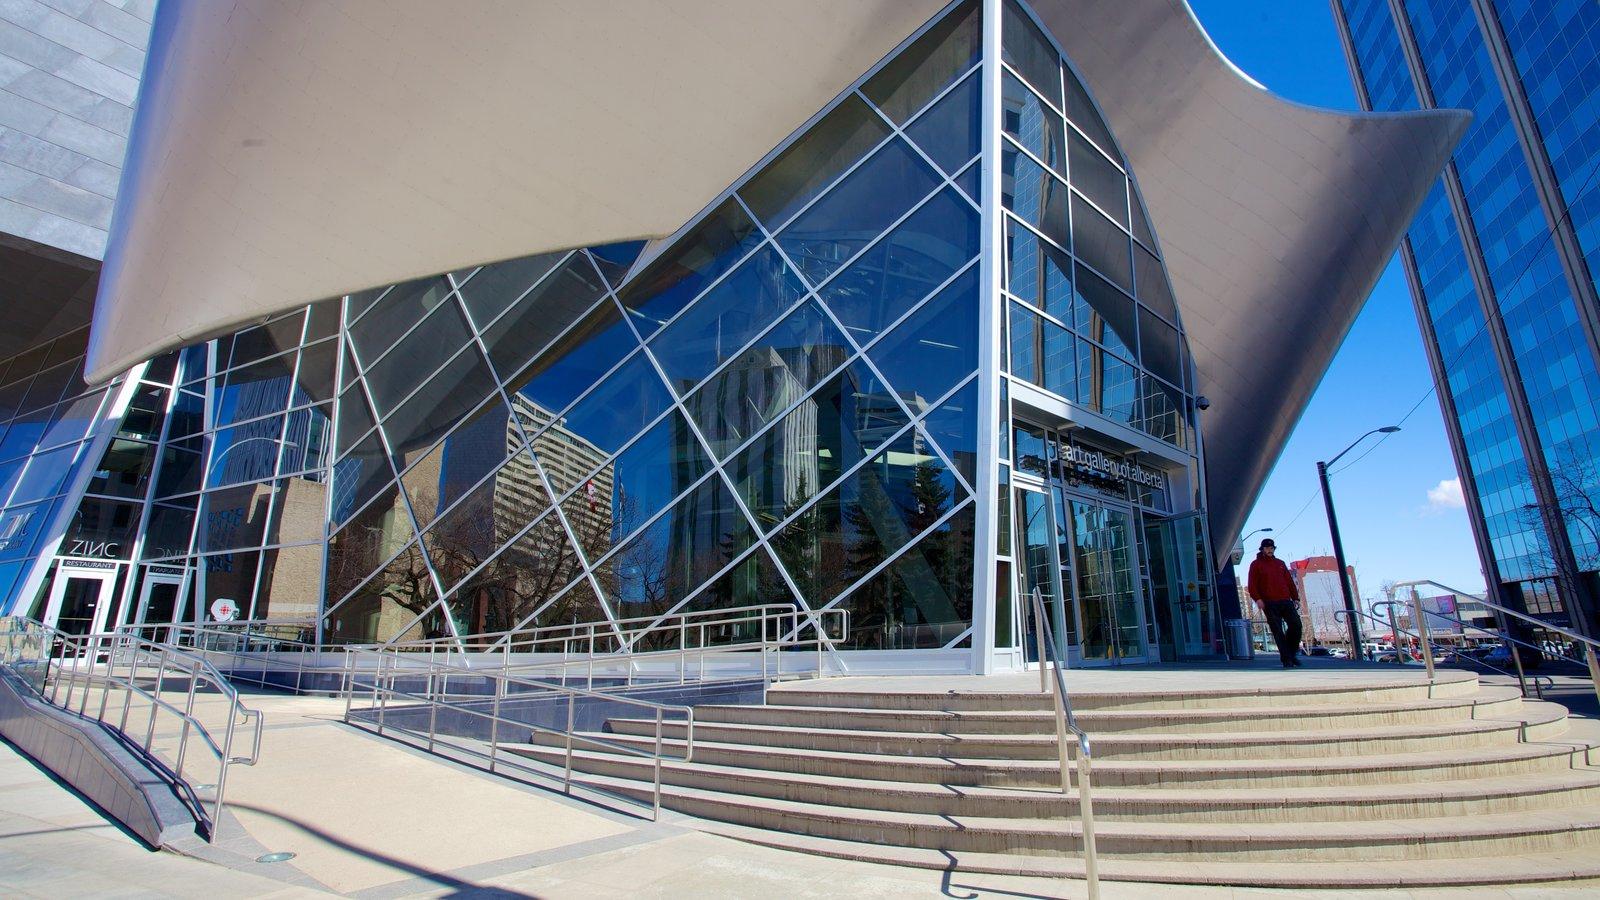 Art Gallery of Alberta featuring art, cbd and a city